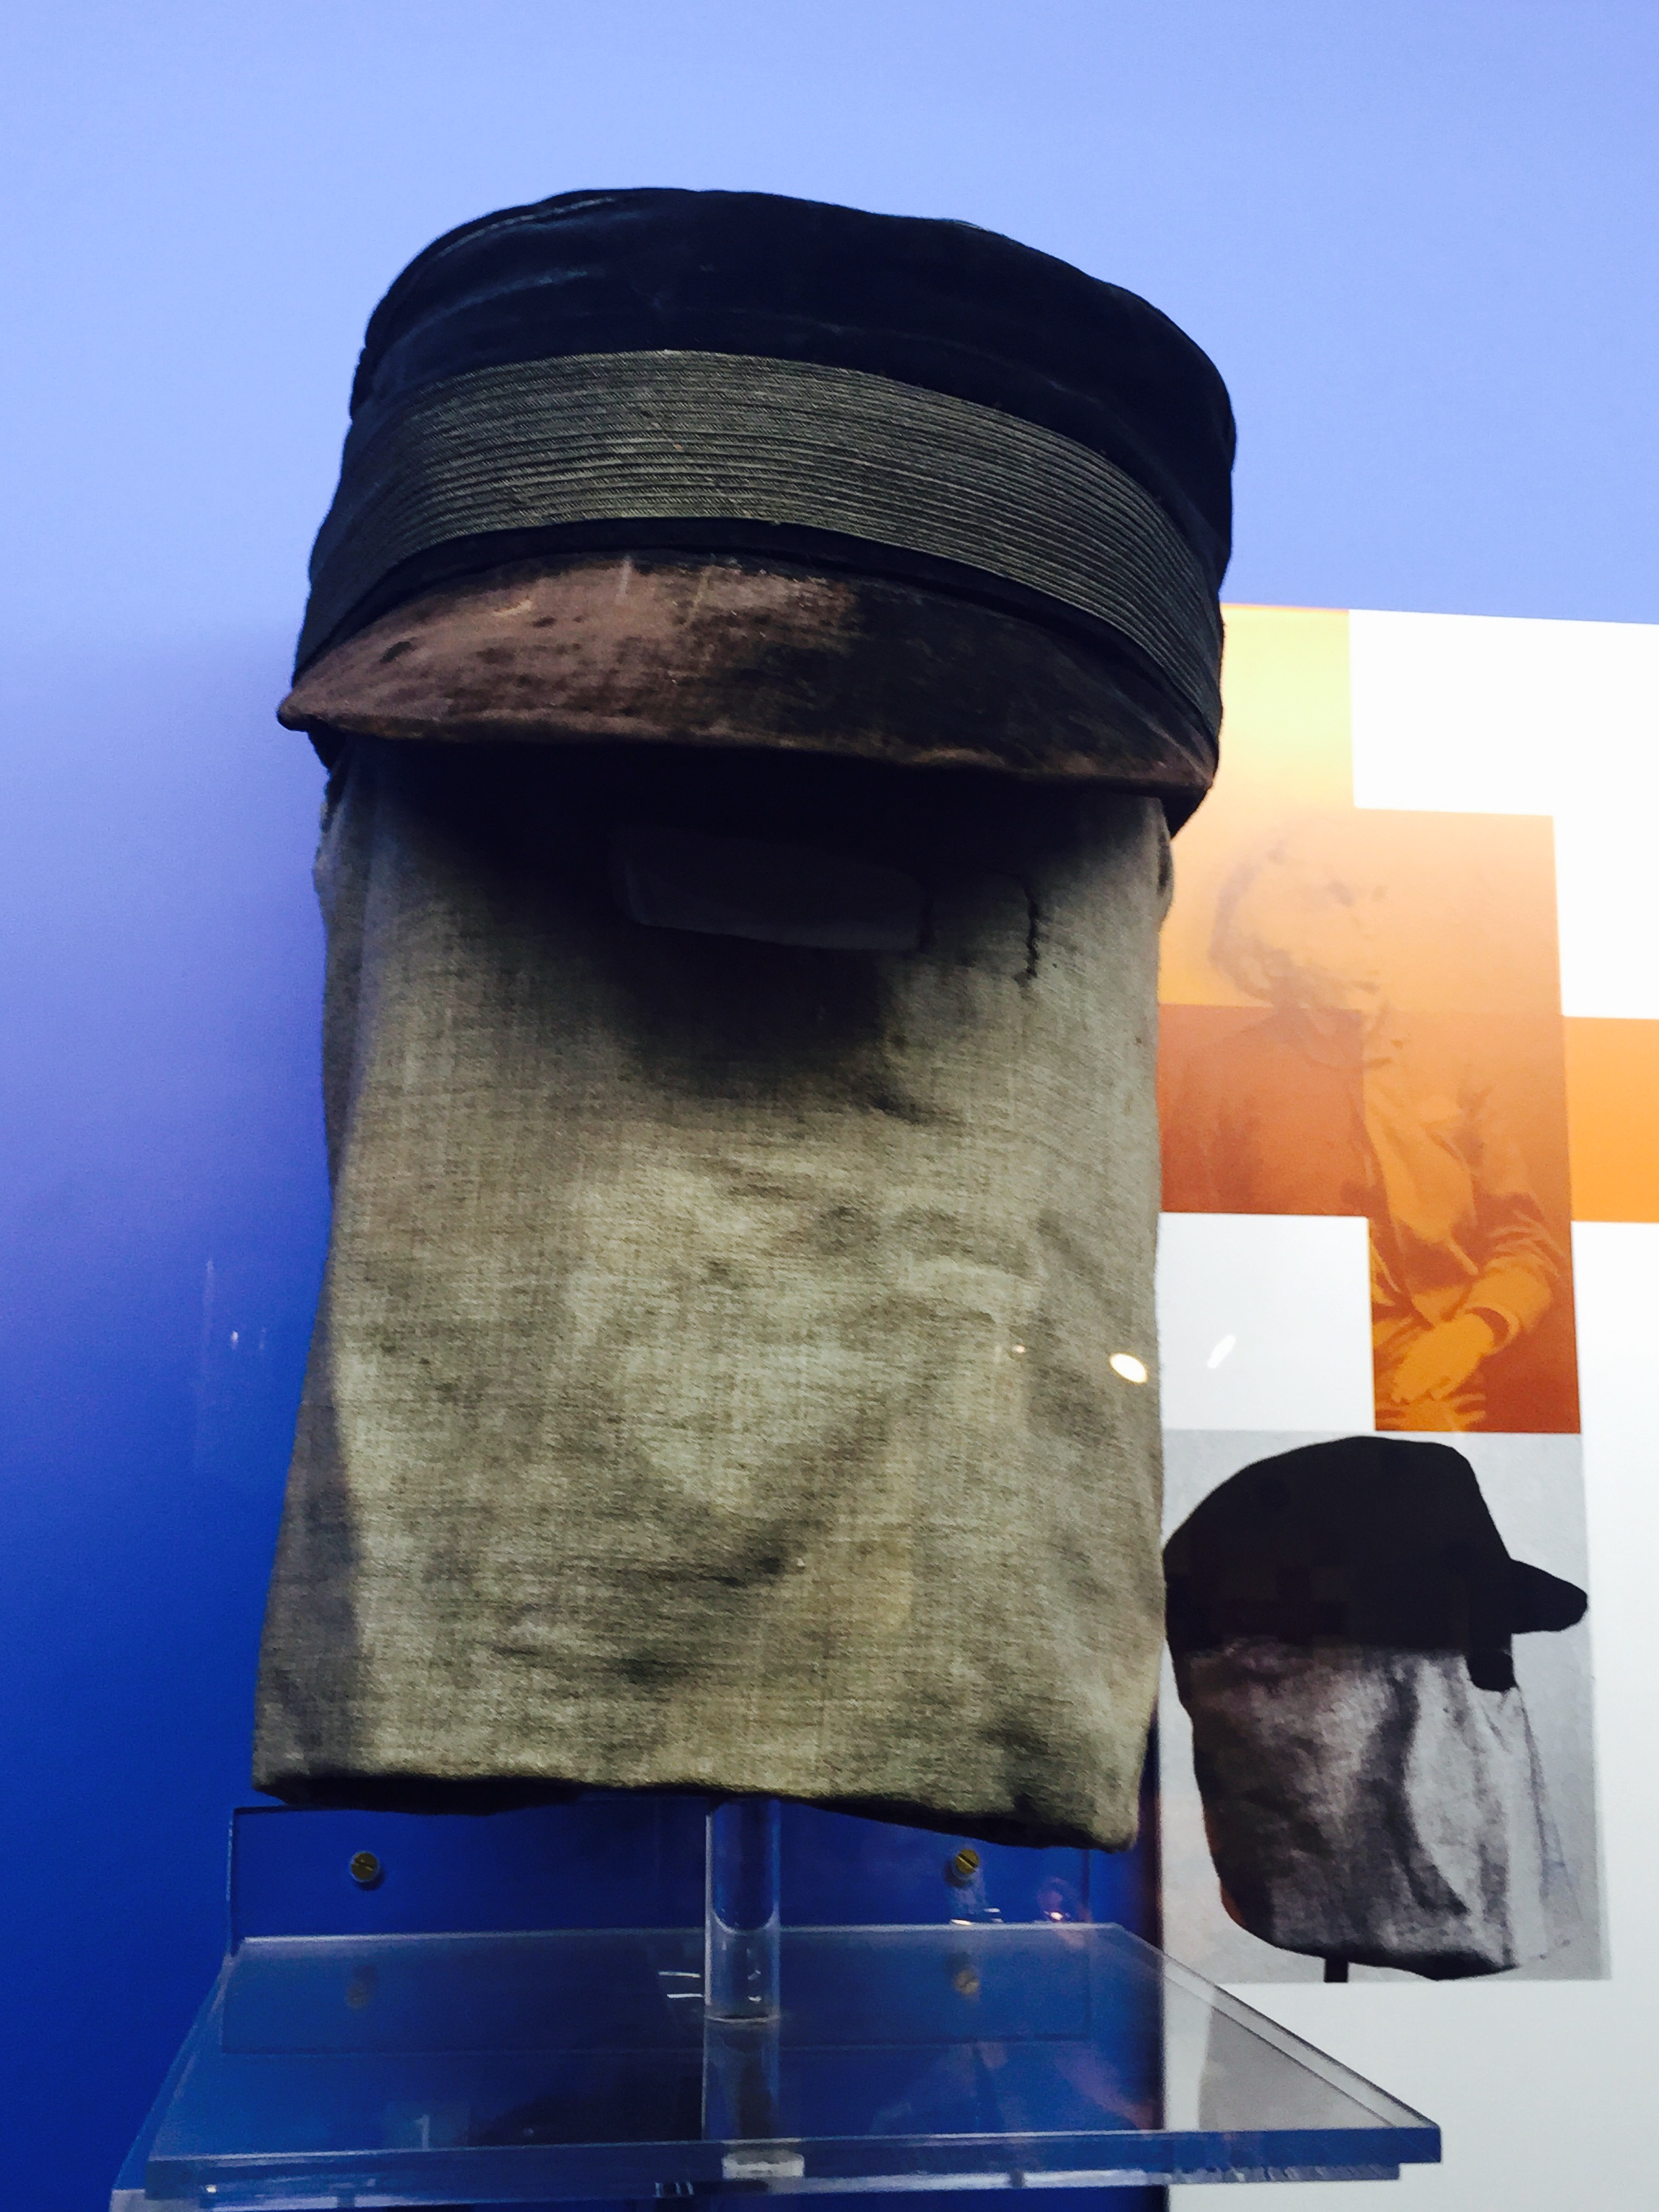 Merrick's Hat